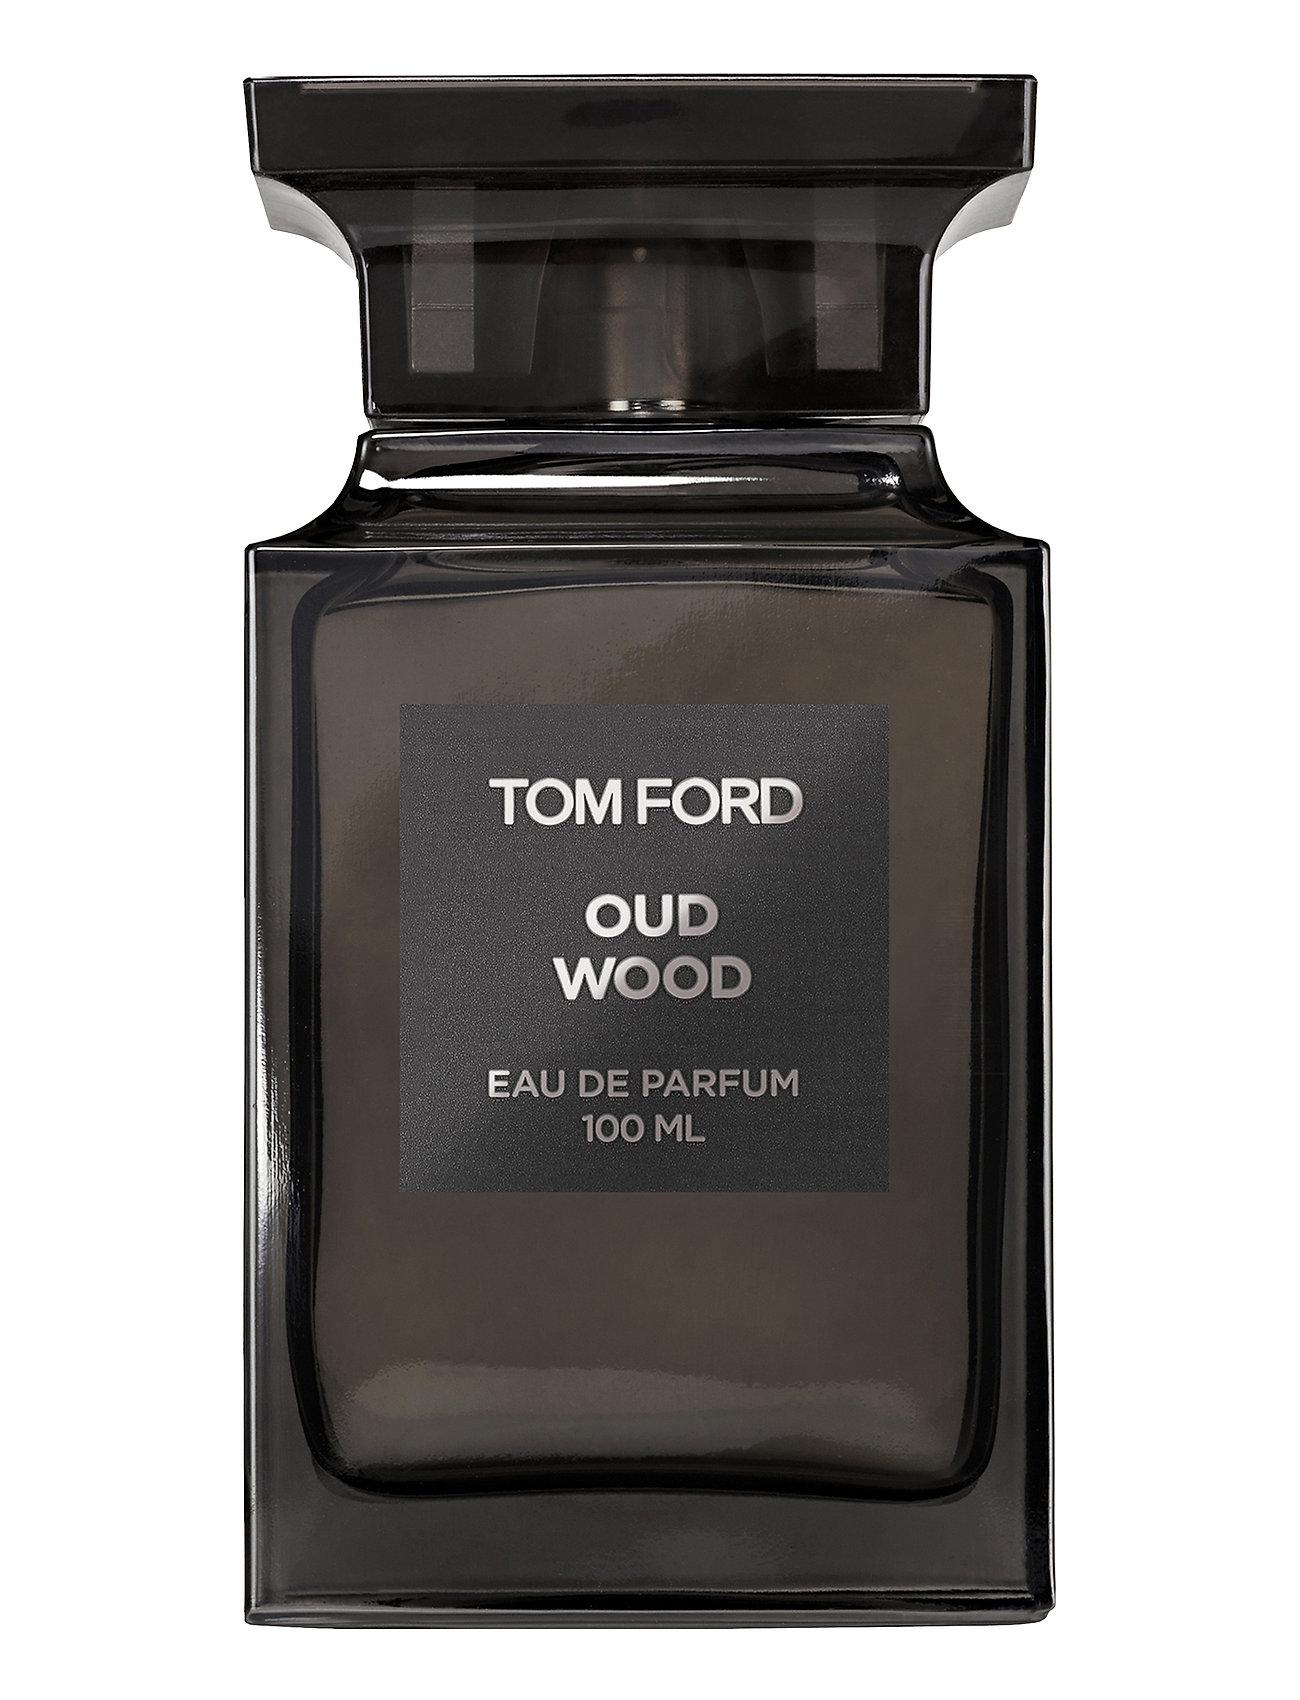 tom ford Oud wood eau de parfum på boozt.com dk